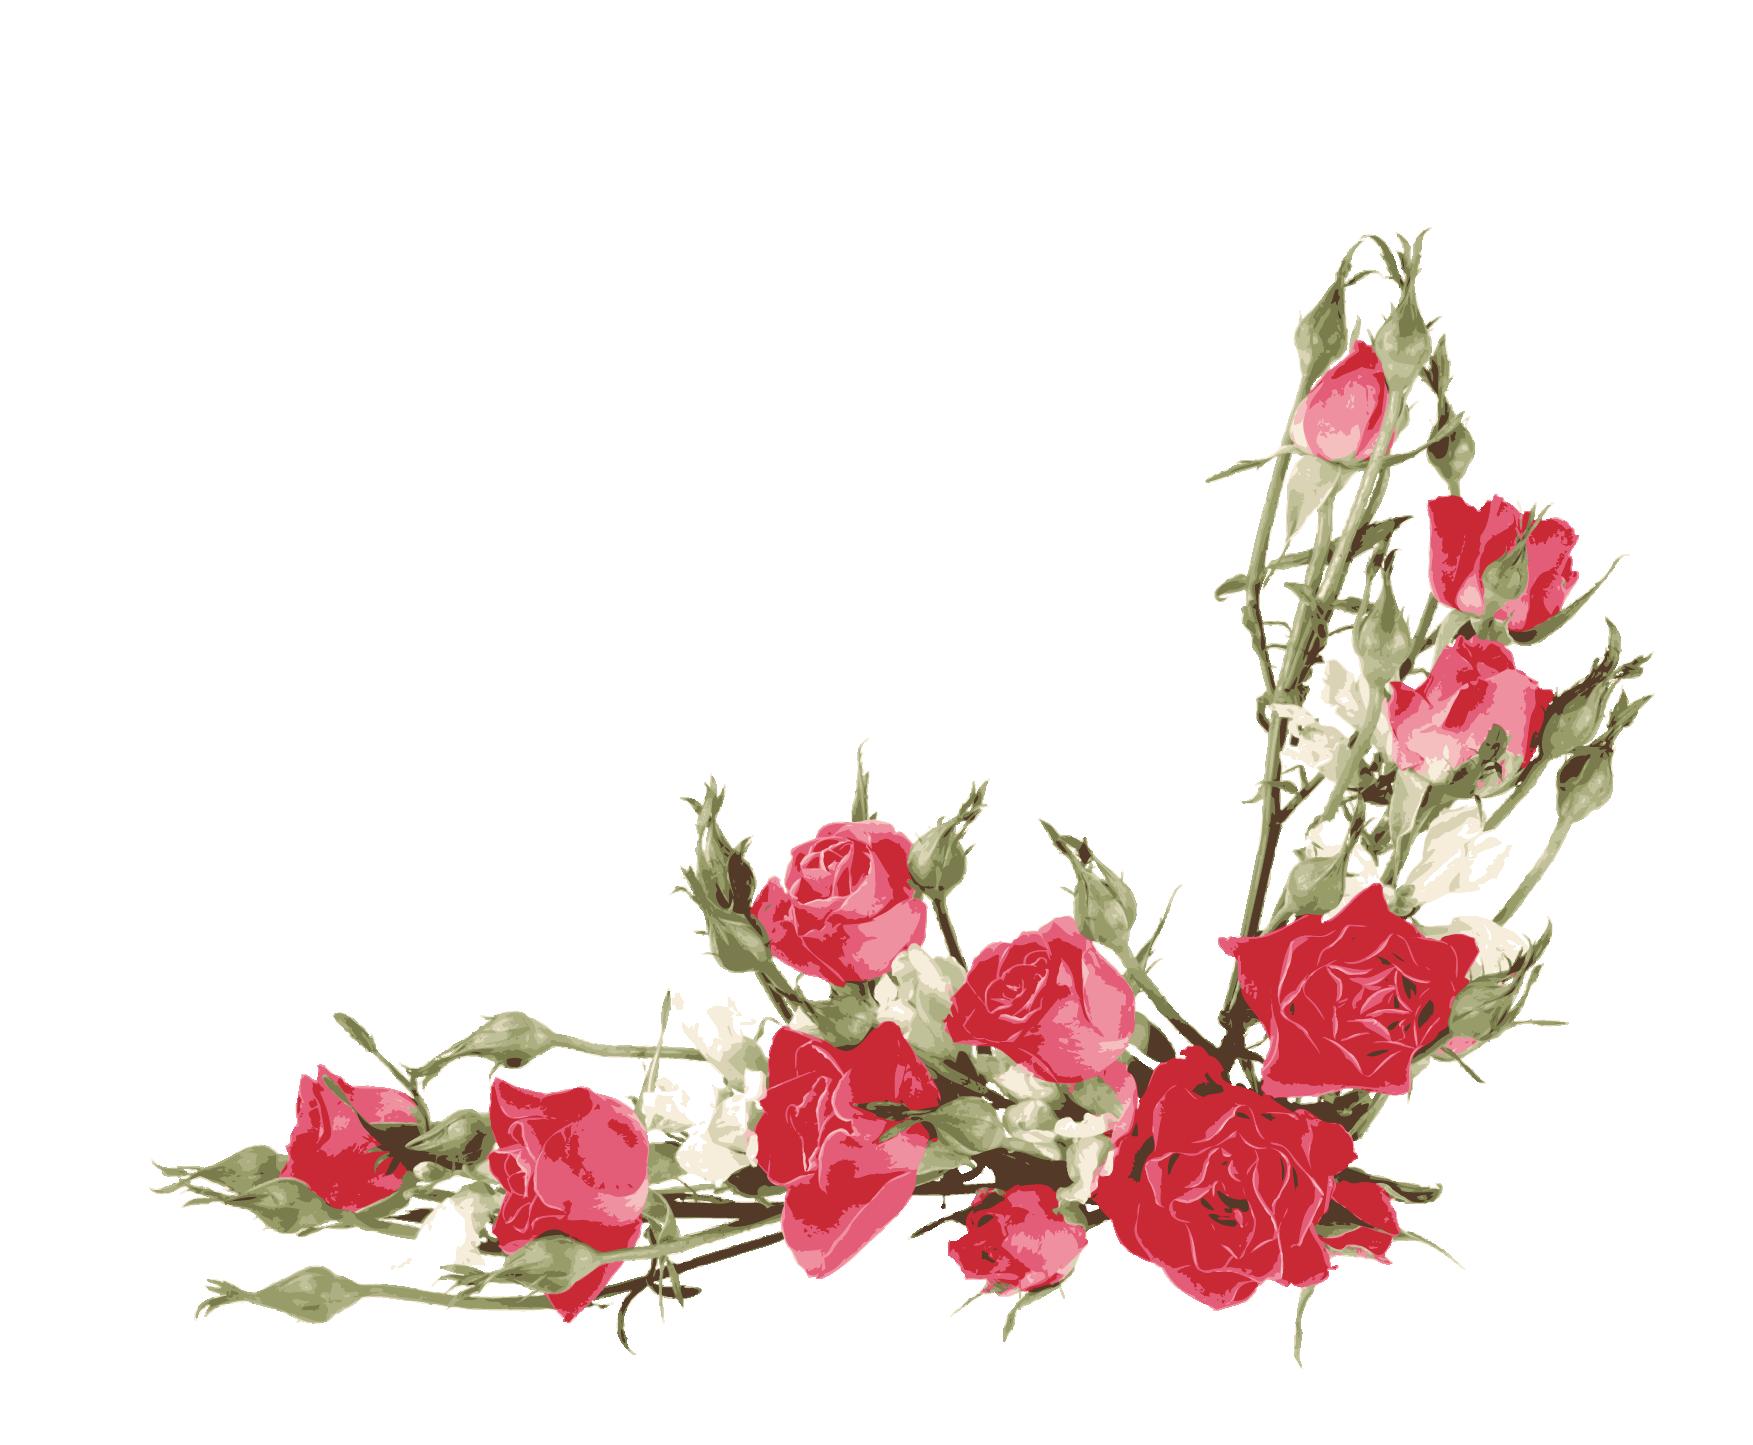 Flower bouquet border clipart clip stock Rose Flower bouquet Clip art - Red Rose Border 1753*1445 transprent ... clip stock